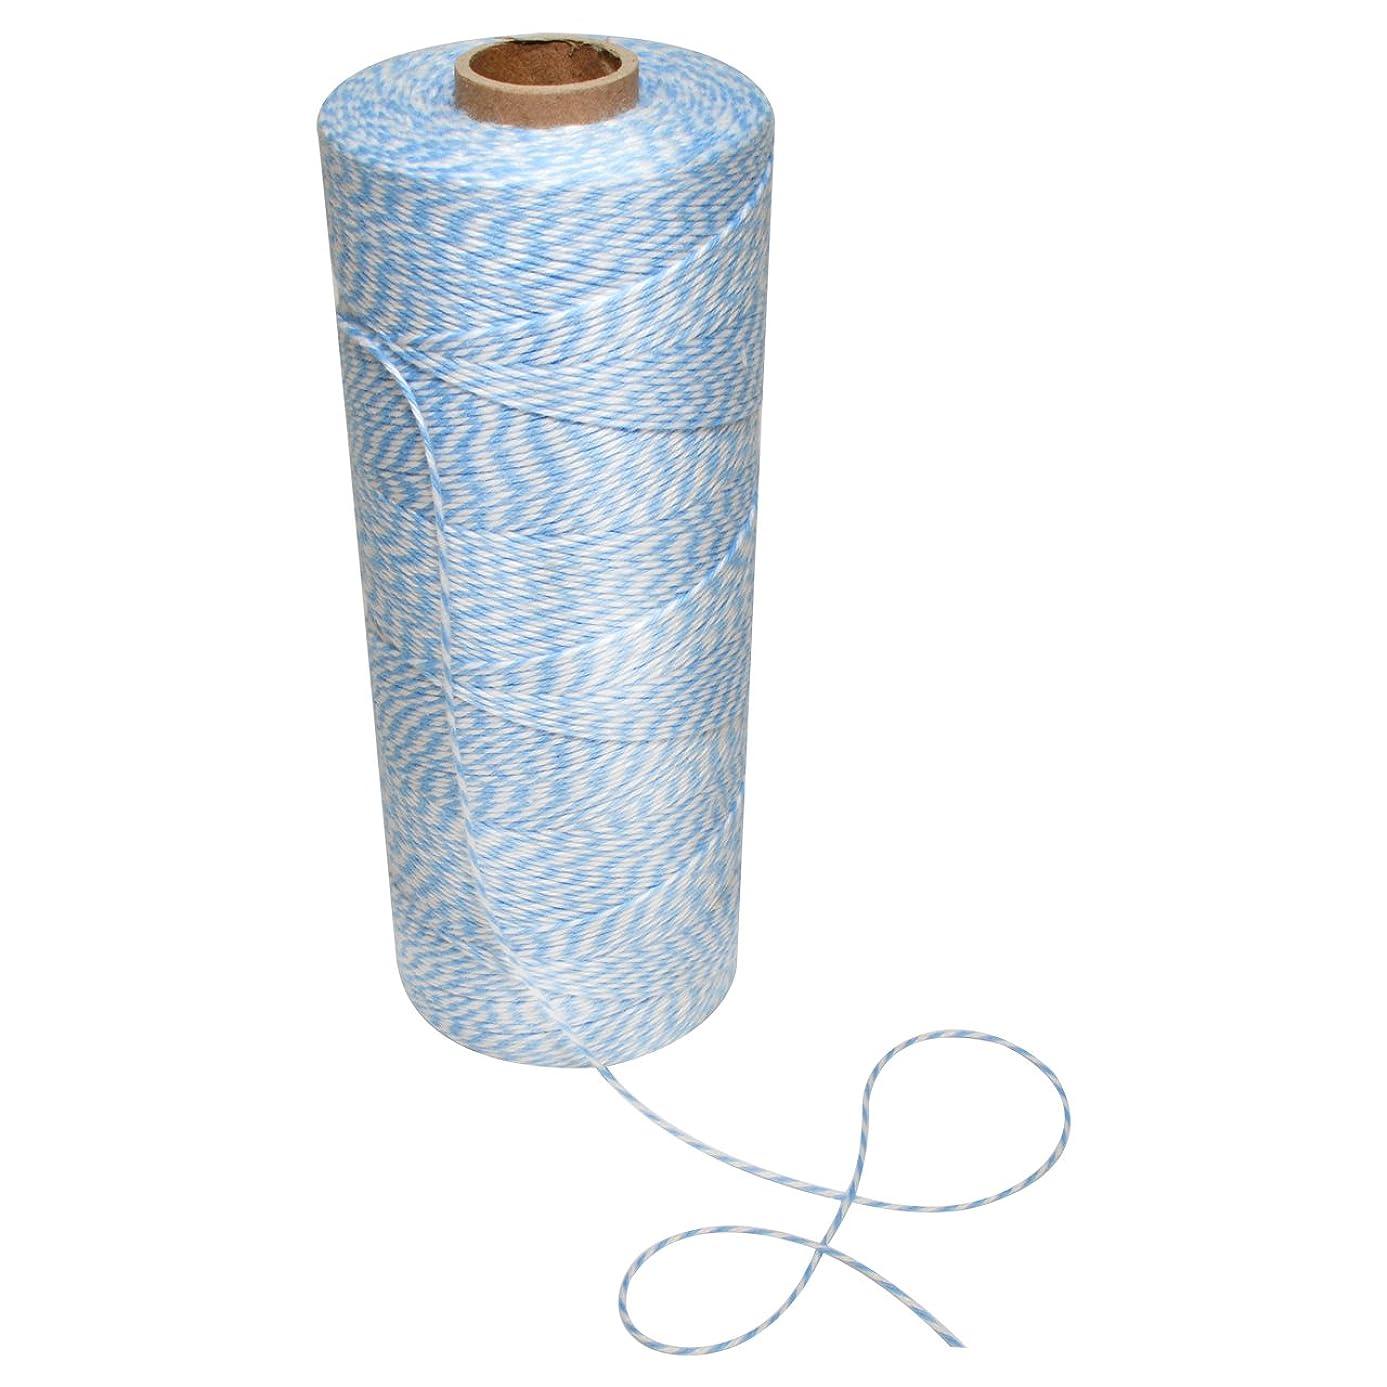 Morex Ribbon 1201.02/00-602 Polyester Baker's Twine Craft Supplies, 1/16